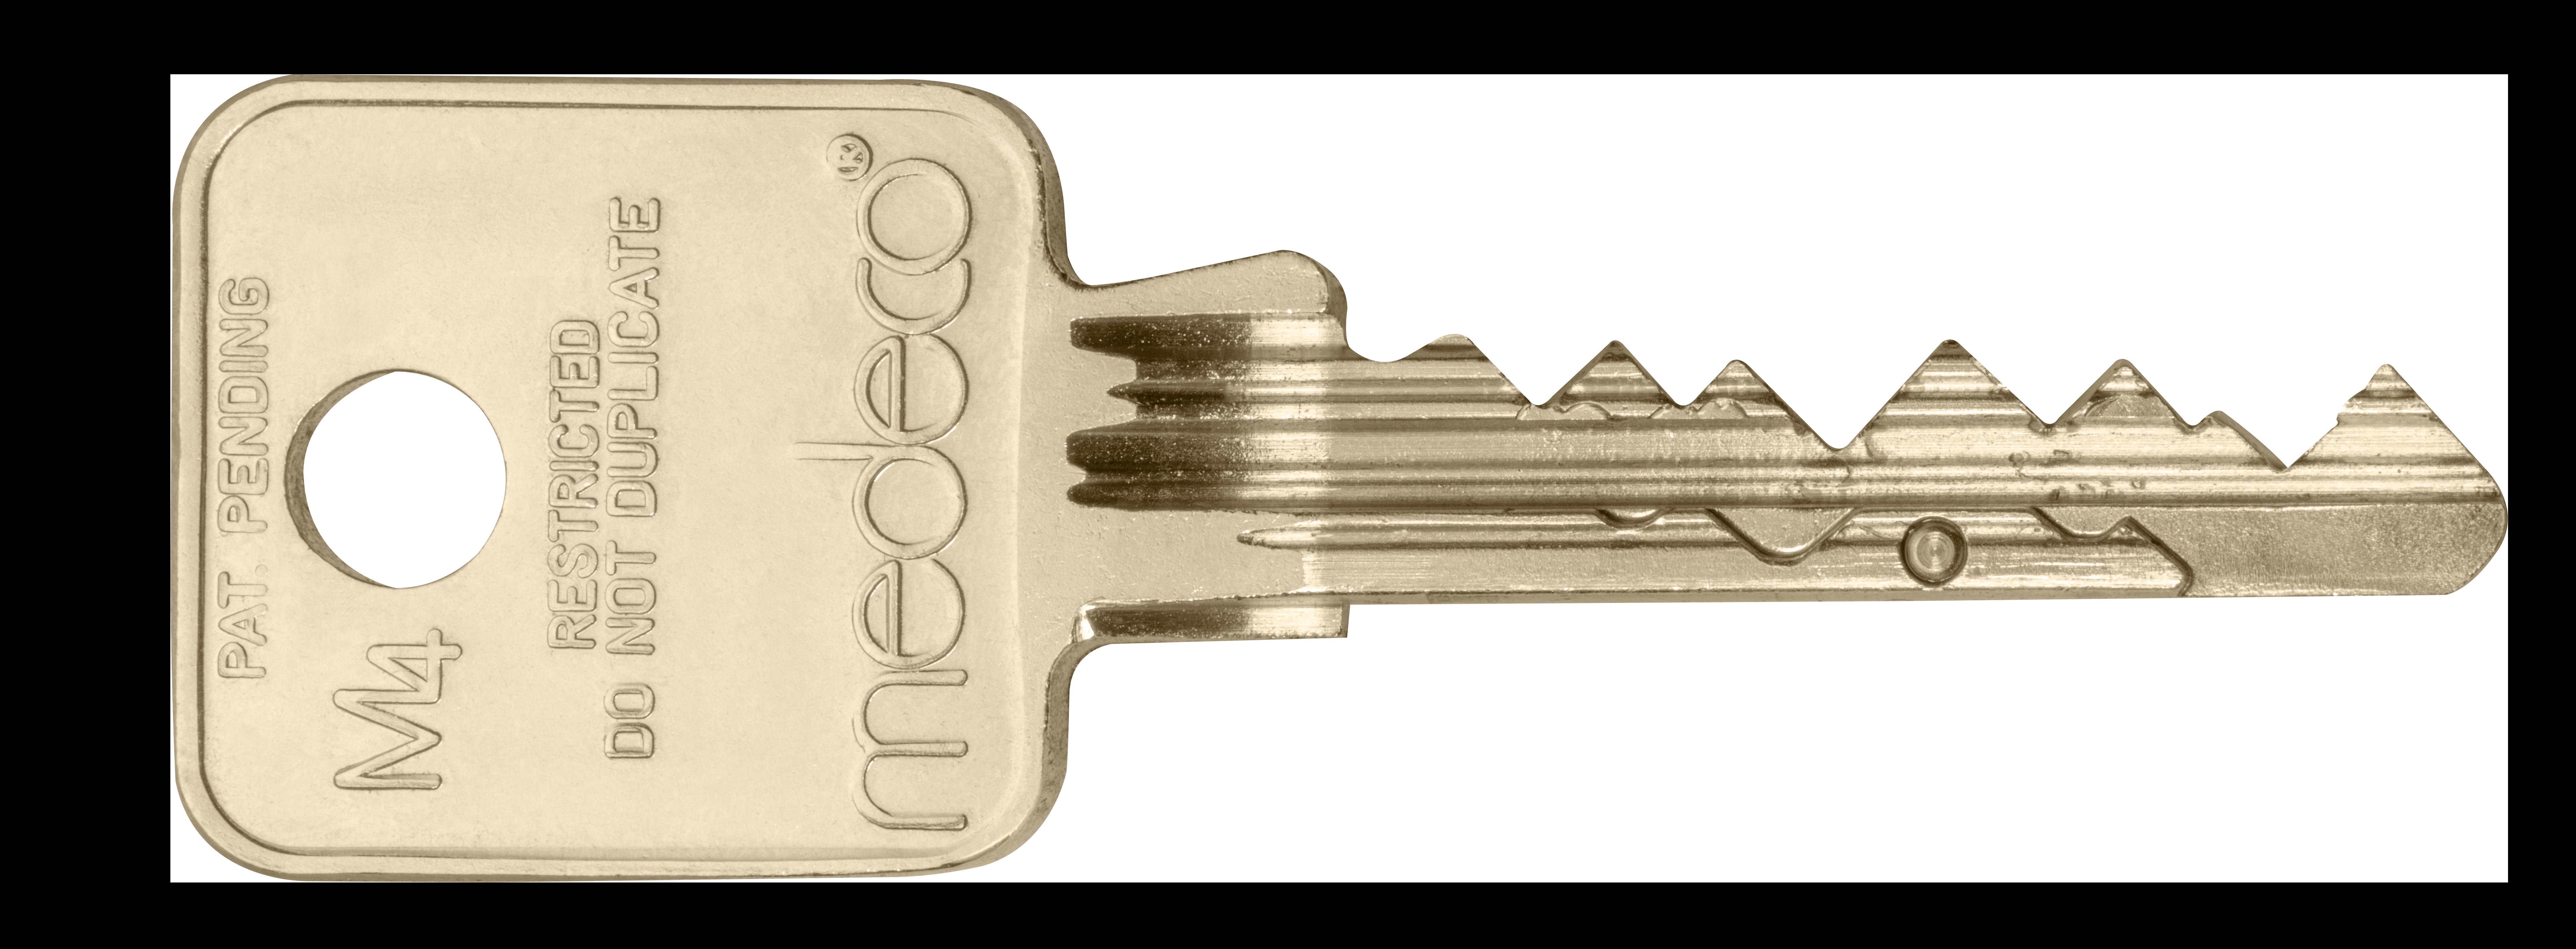 medeco locking technologies